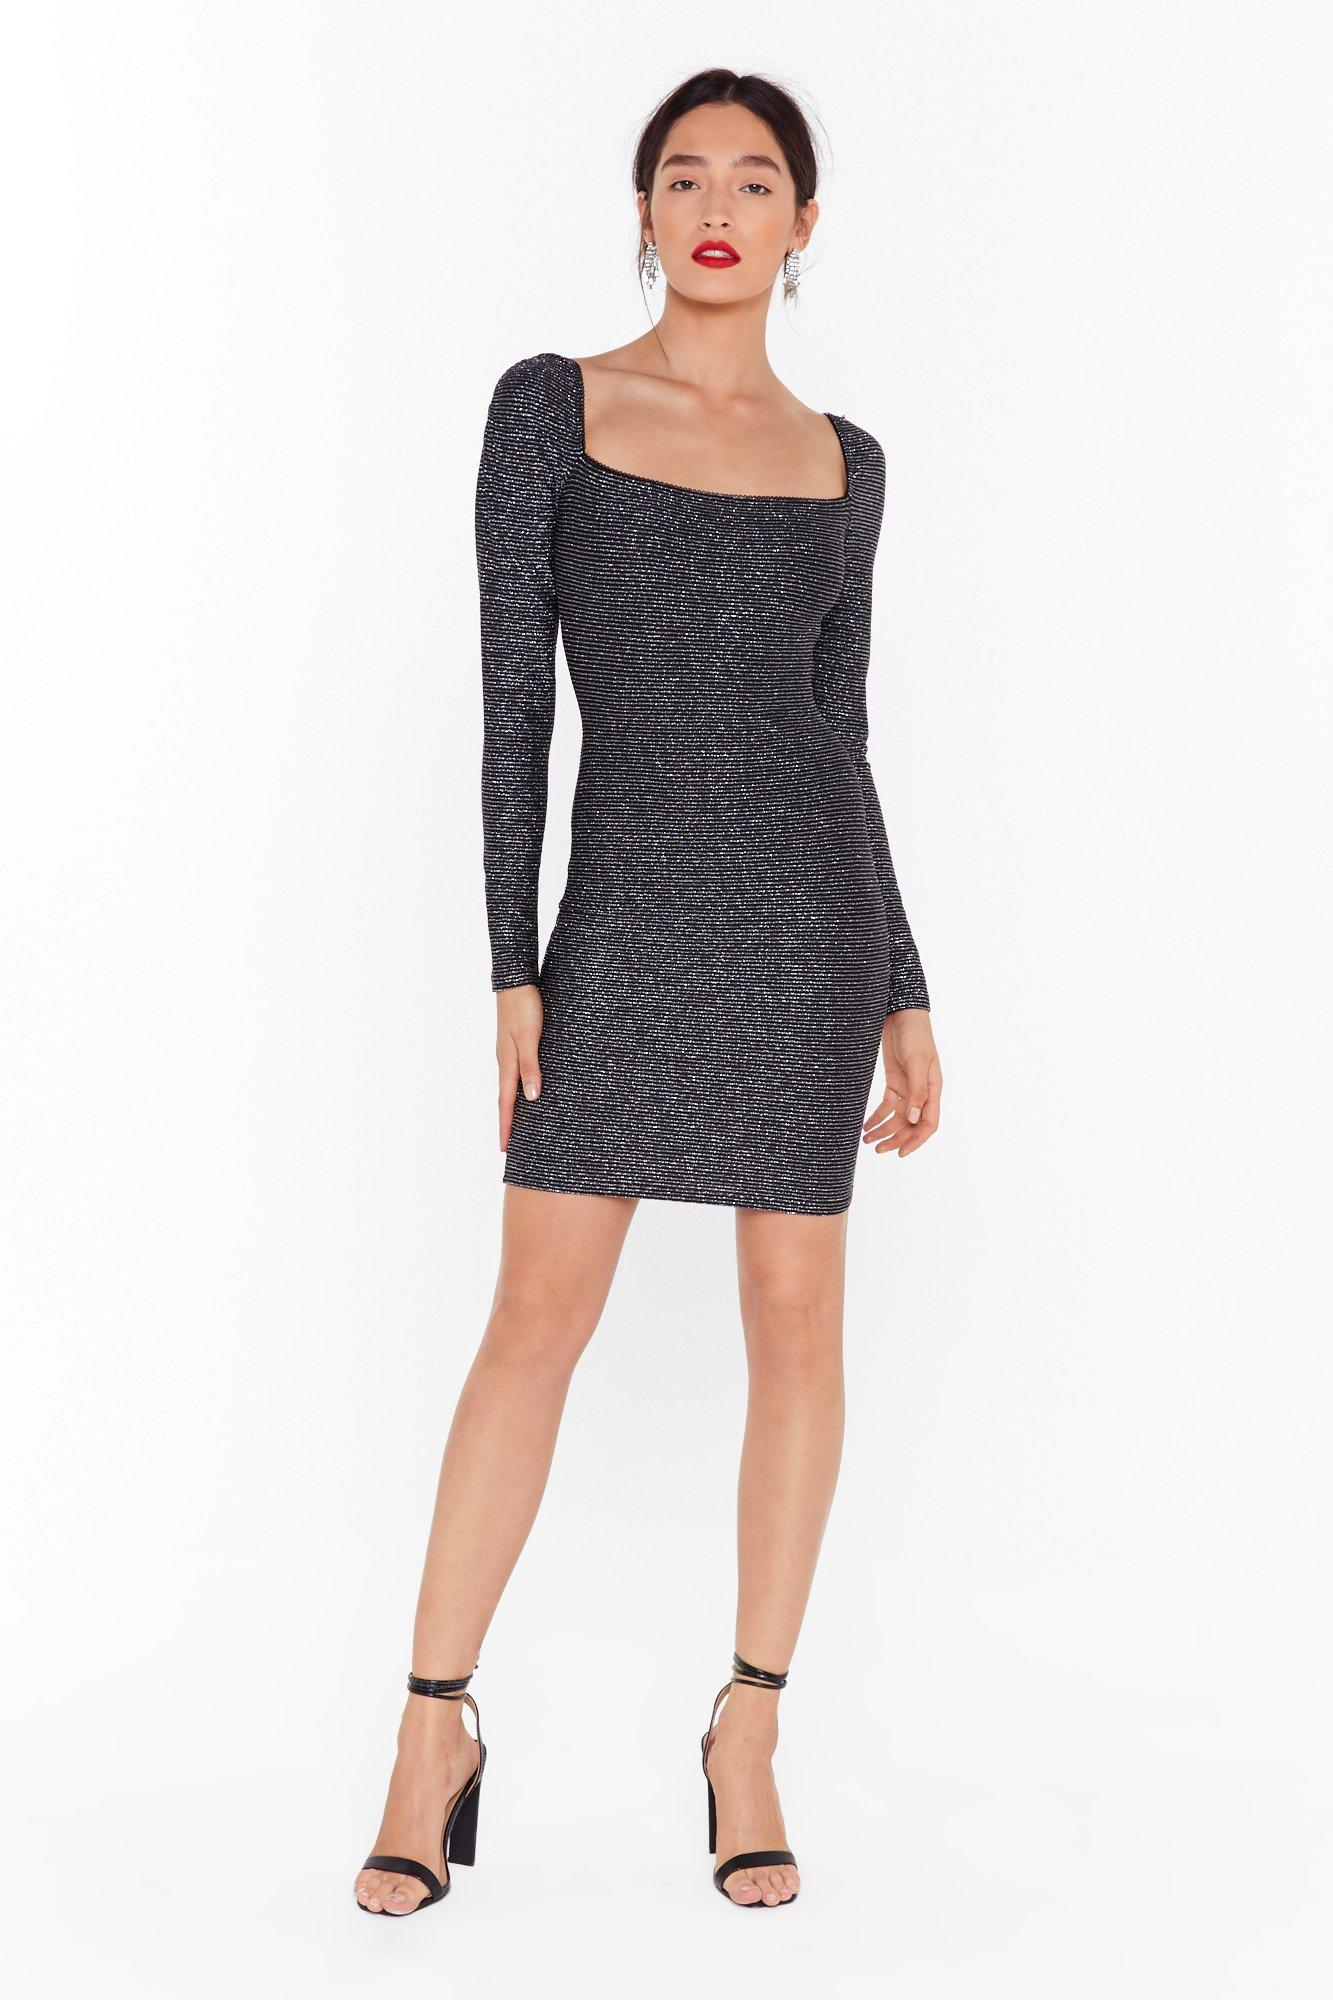 Image of Onto a Shimmer Glitter Mini Dress